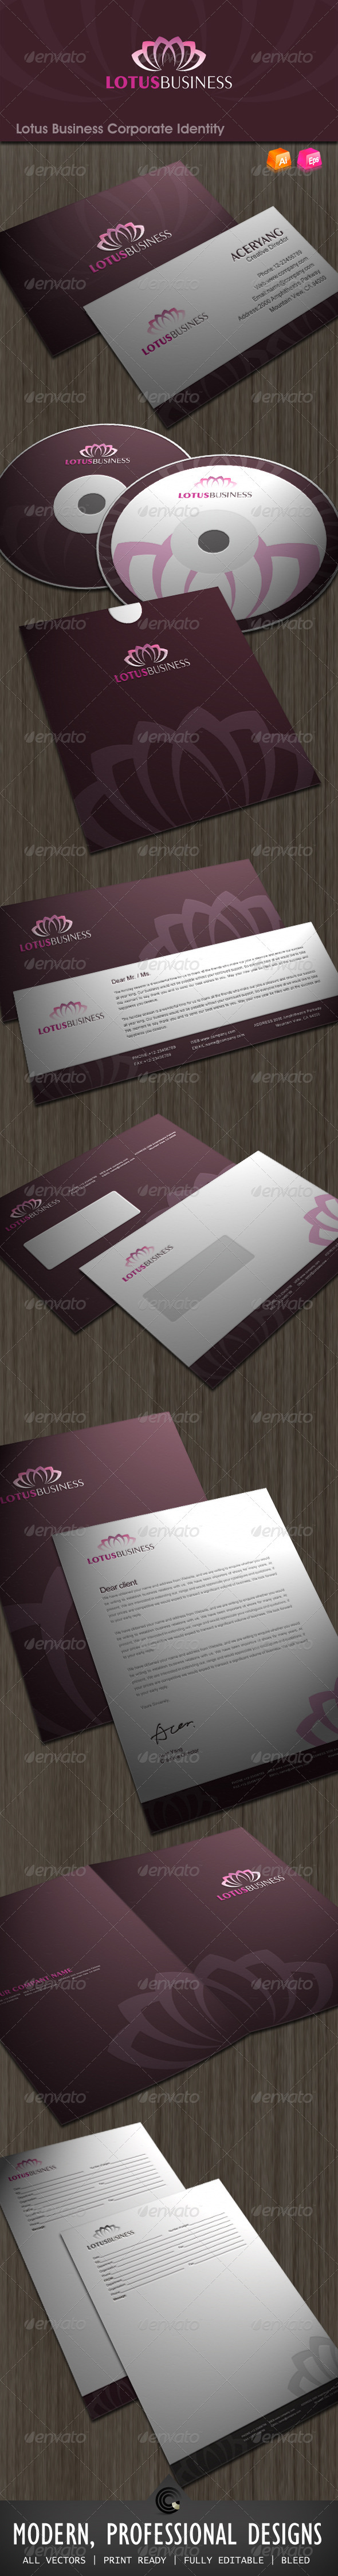 GraphicRiver Lotus Business Corporate Identity 533611